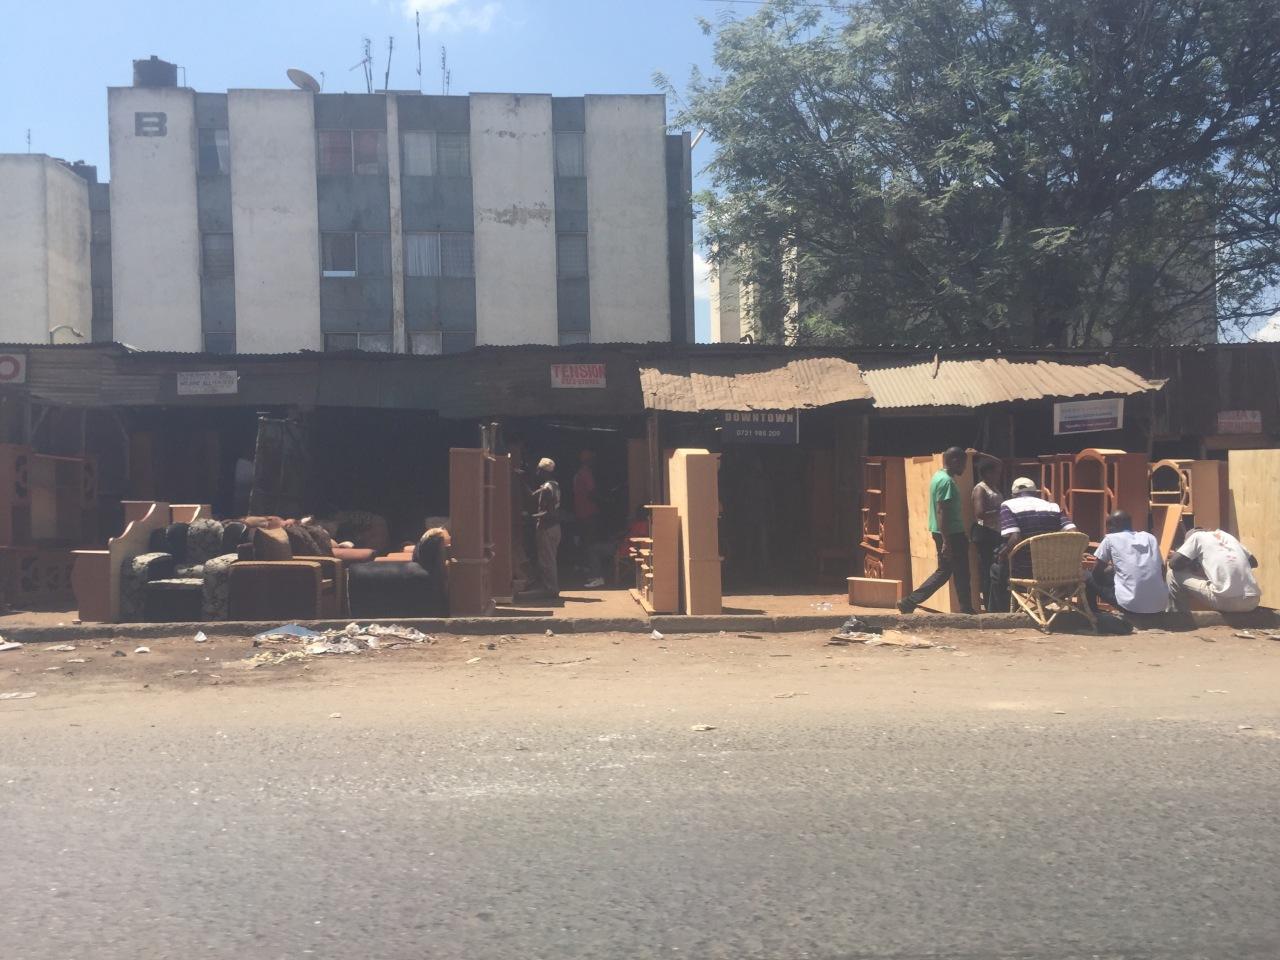 Nairobi is the retail capital of theworld